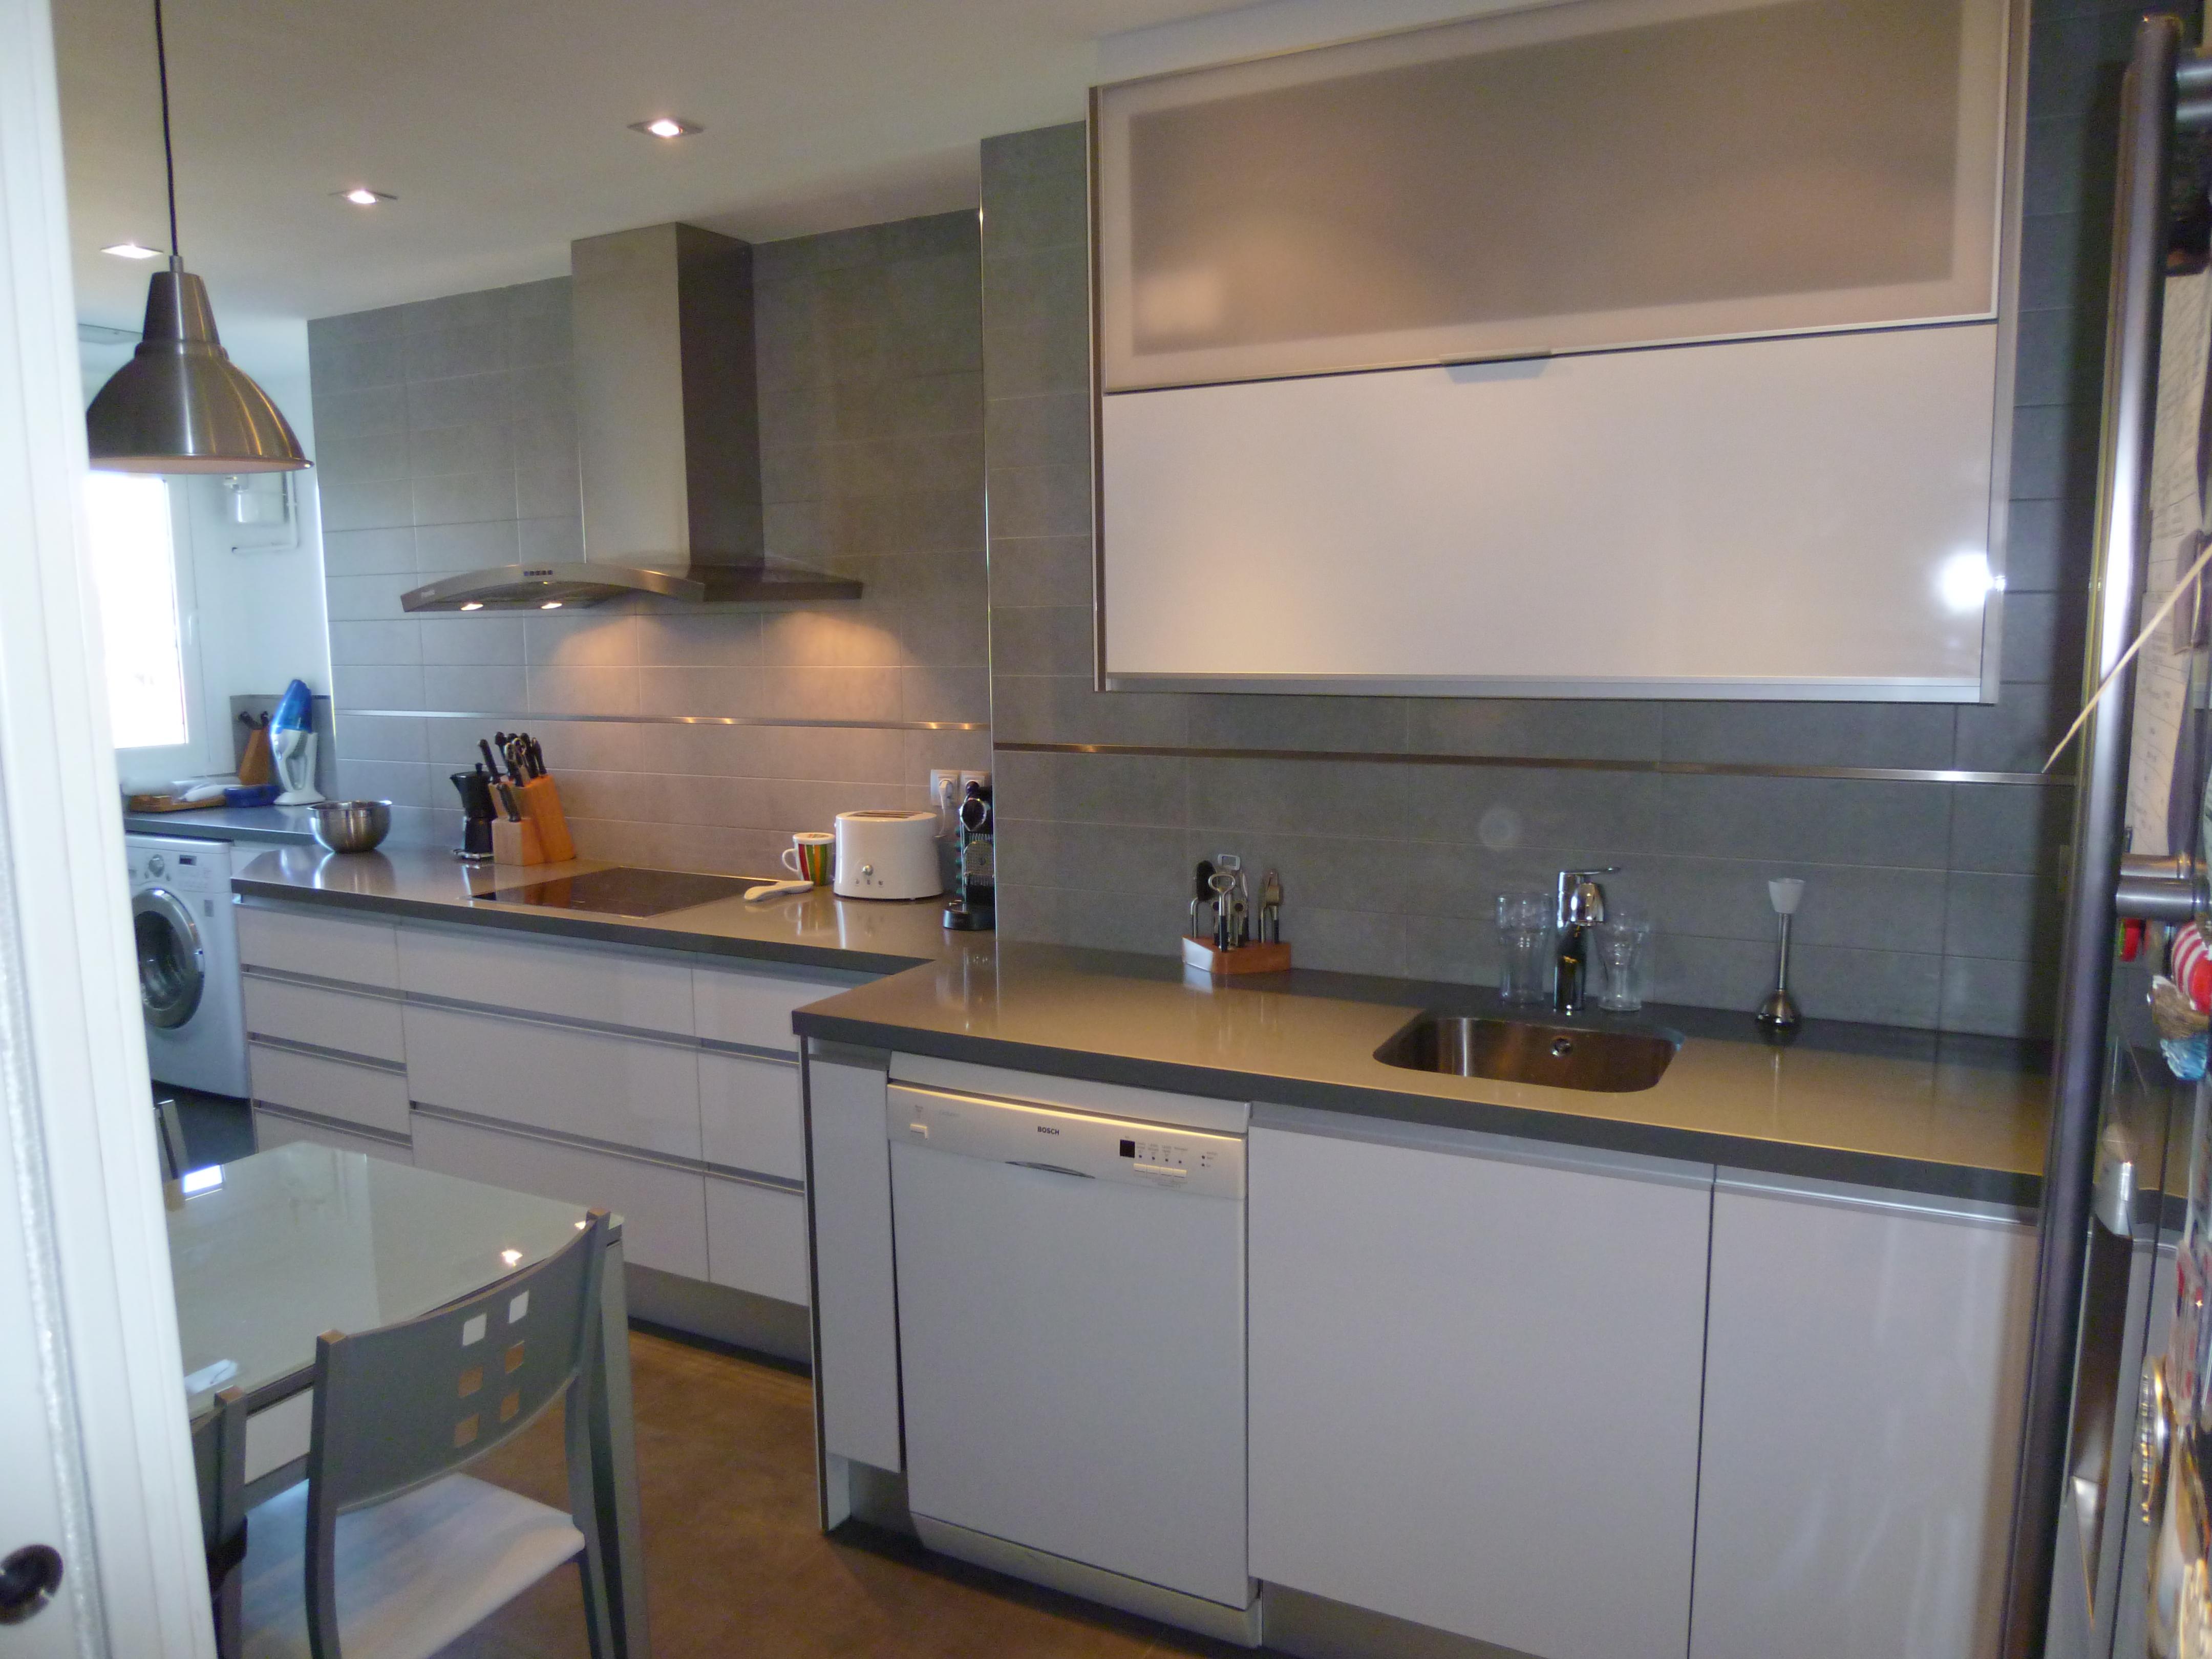 Cocinas abiertas o cerradas alicia mesa dise adora for Cocinas semiabiertas